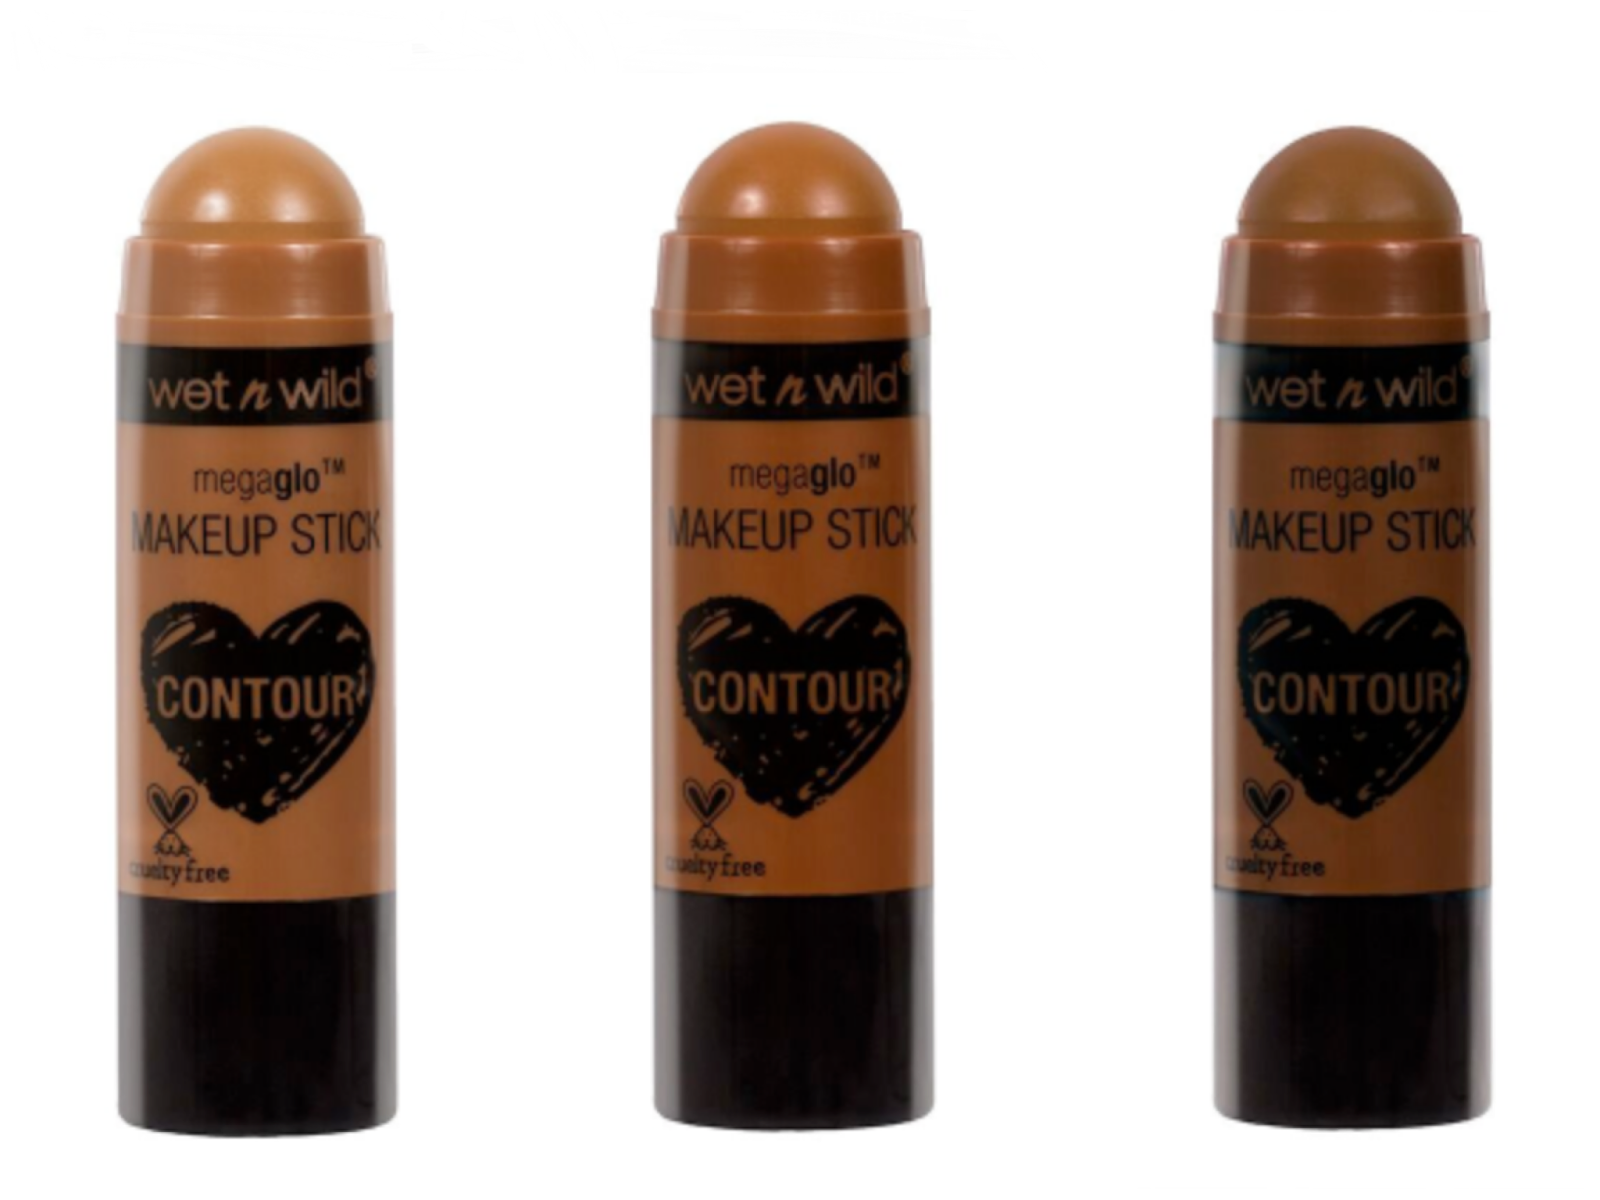 Kkw Contour Kits Dupe Afforable Alternatives Wet N Wild Mega Glo Dual Ended Stick Light Medium Megaglo Makeup Highlight